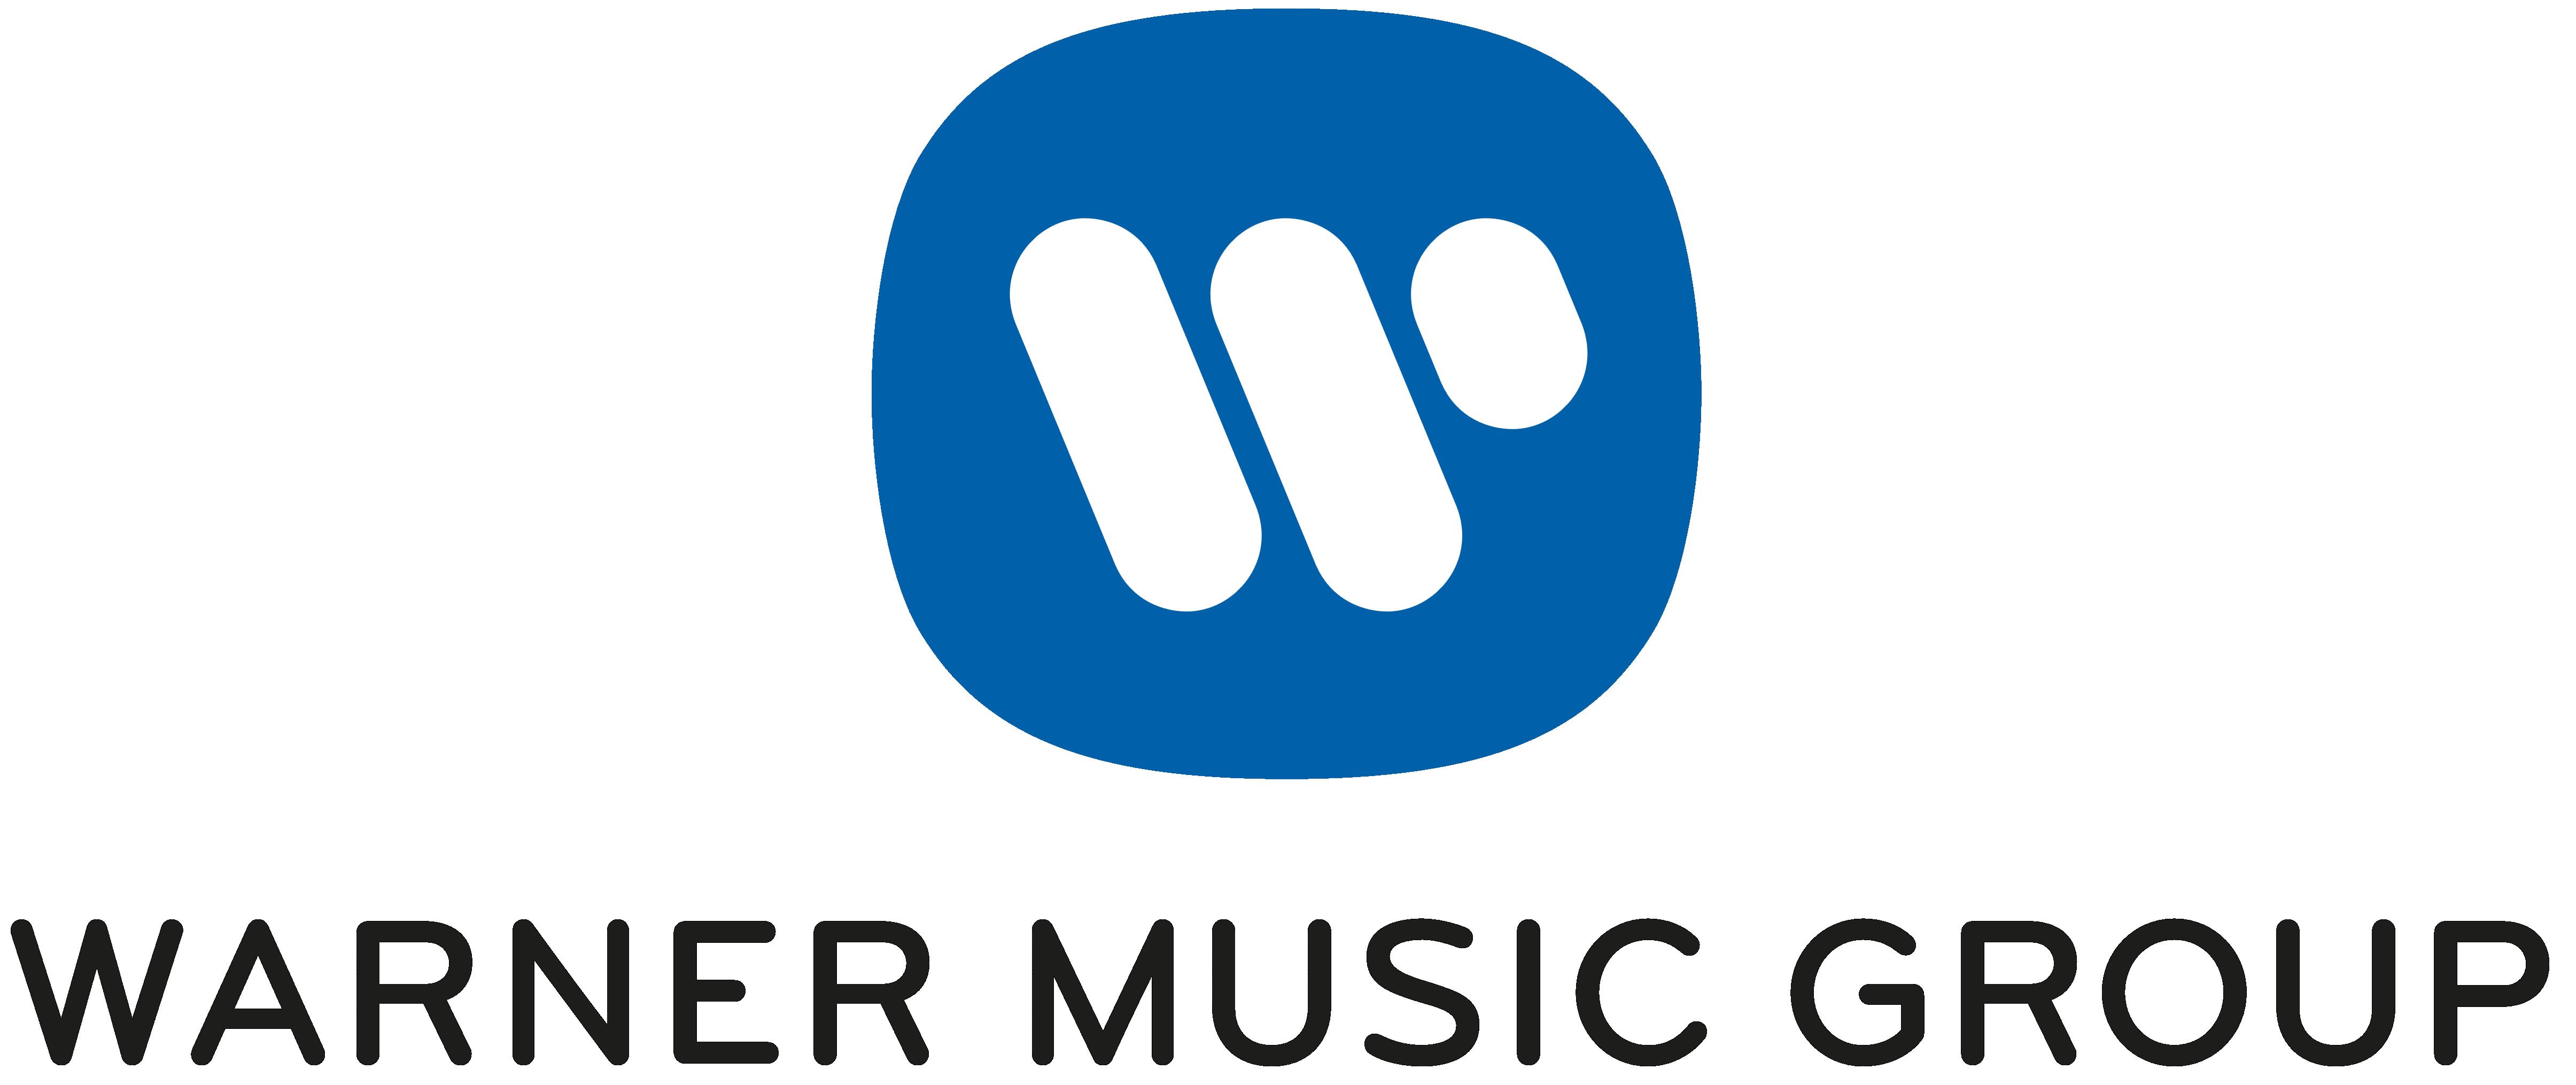 Warner Music Group IPO